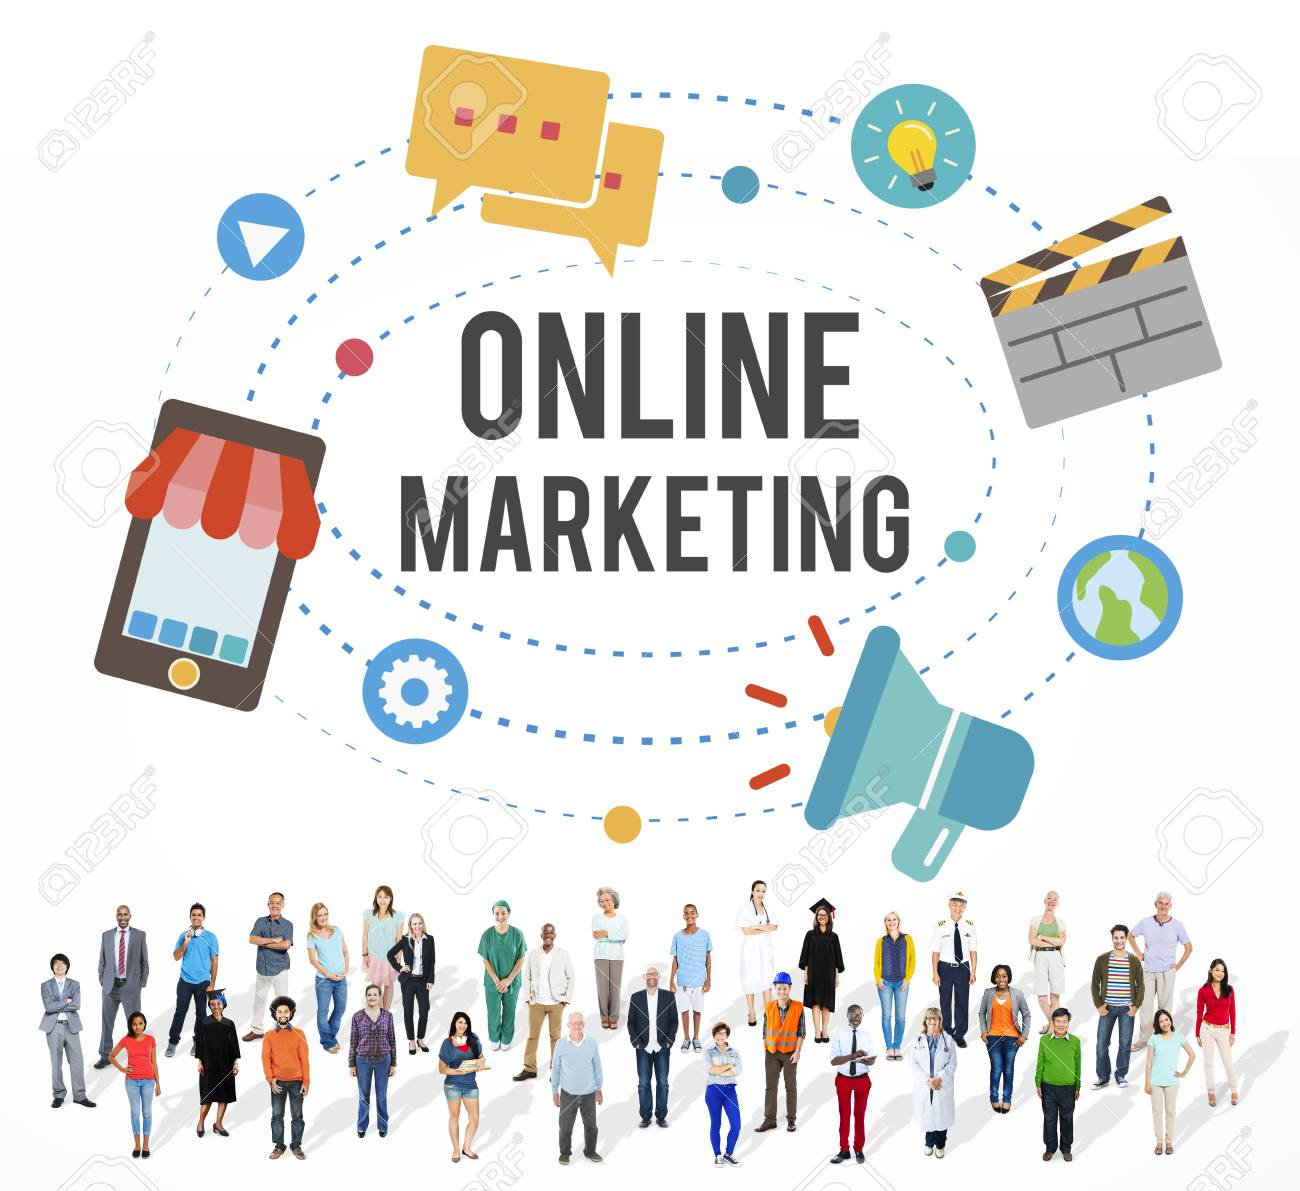 Online Marketing Valencia